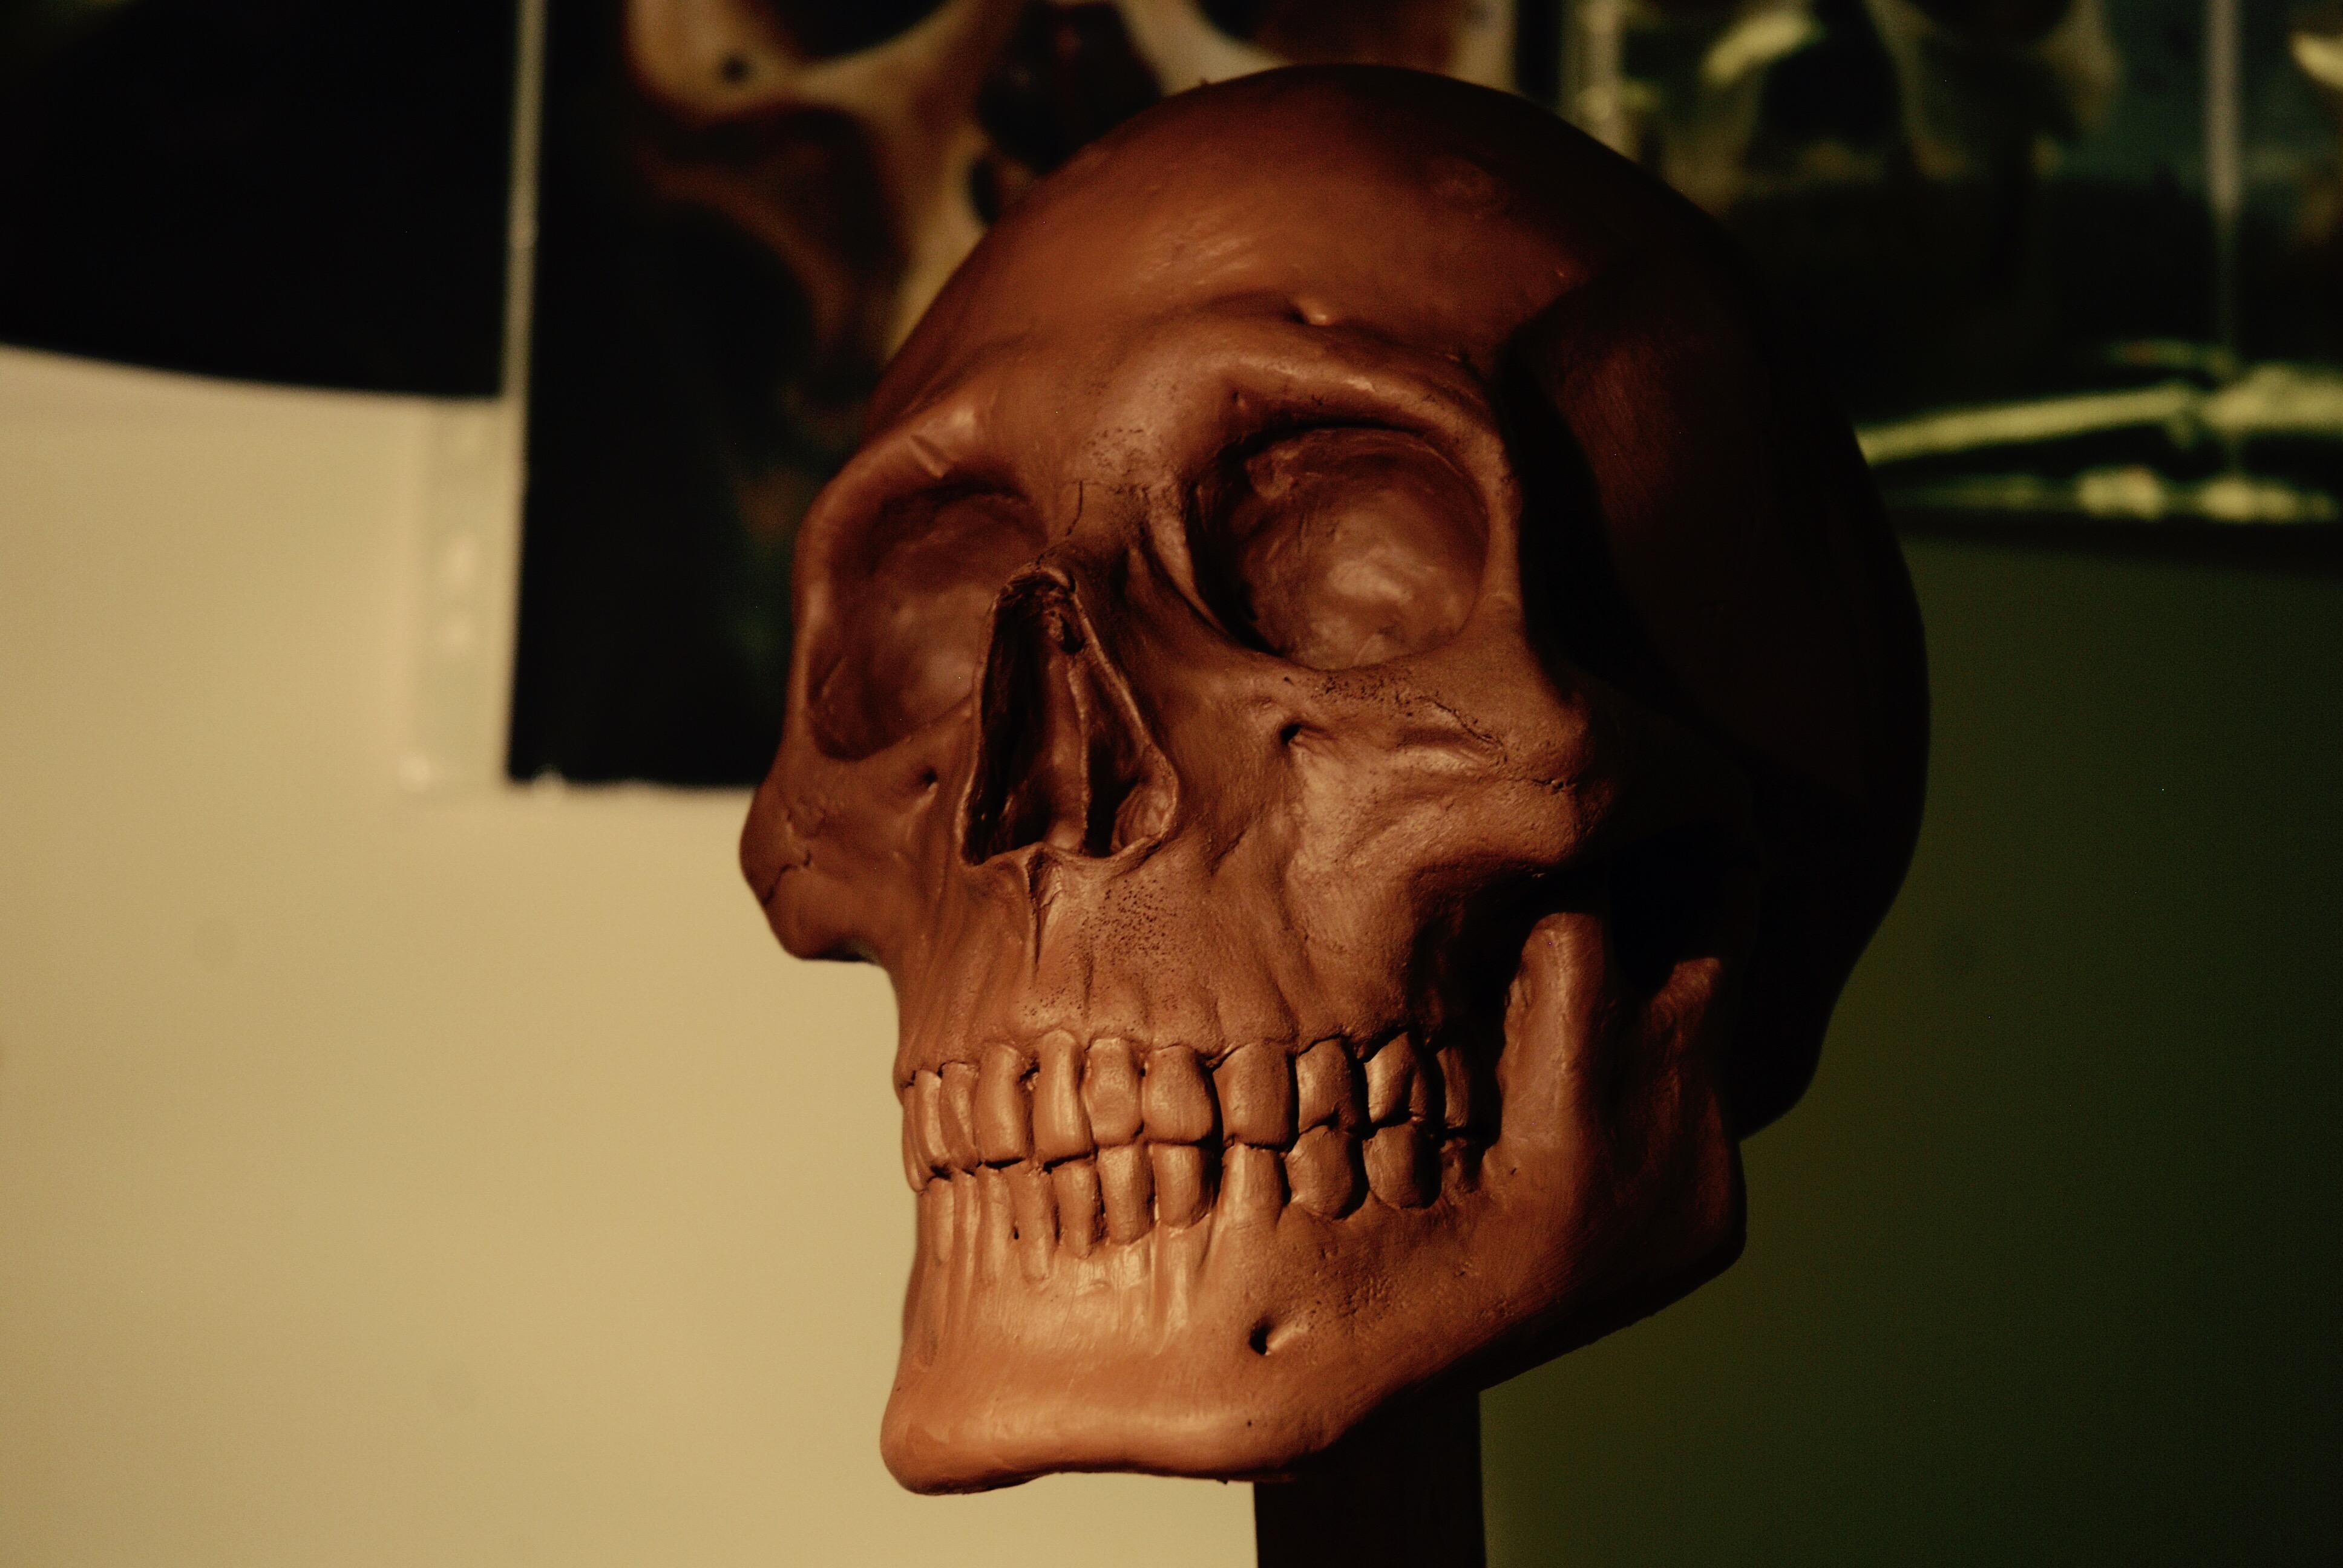 Human Skull replica in teracotta